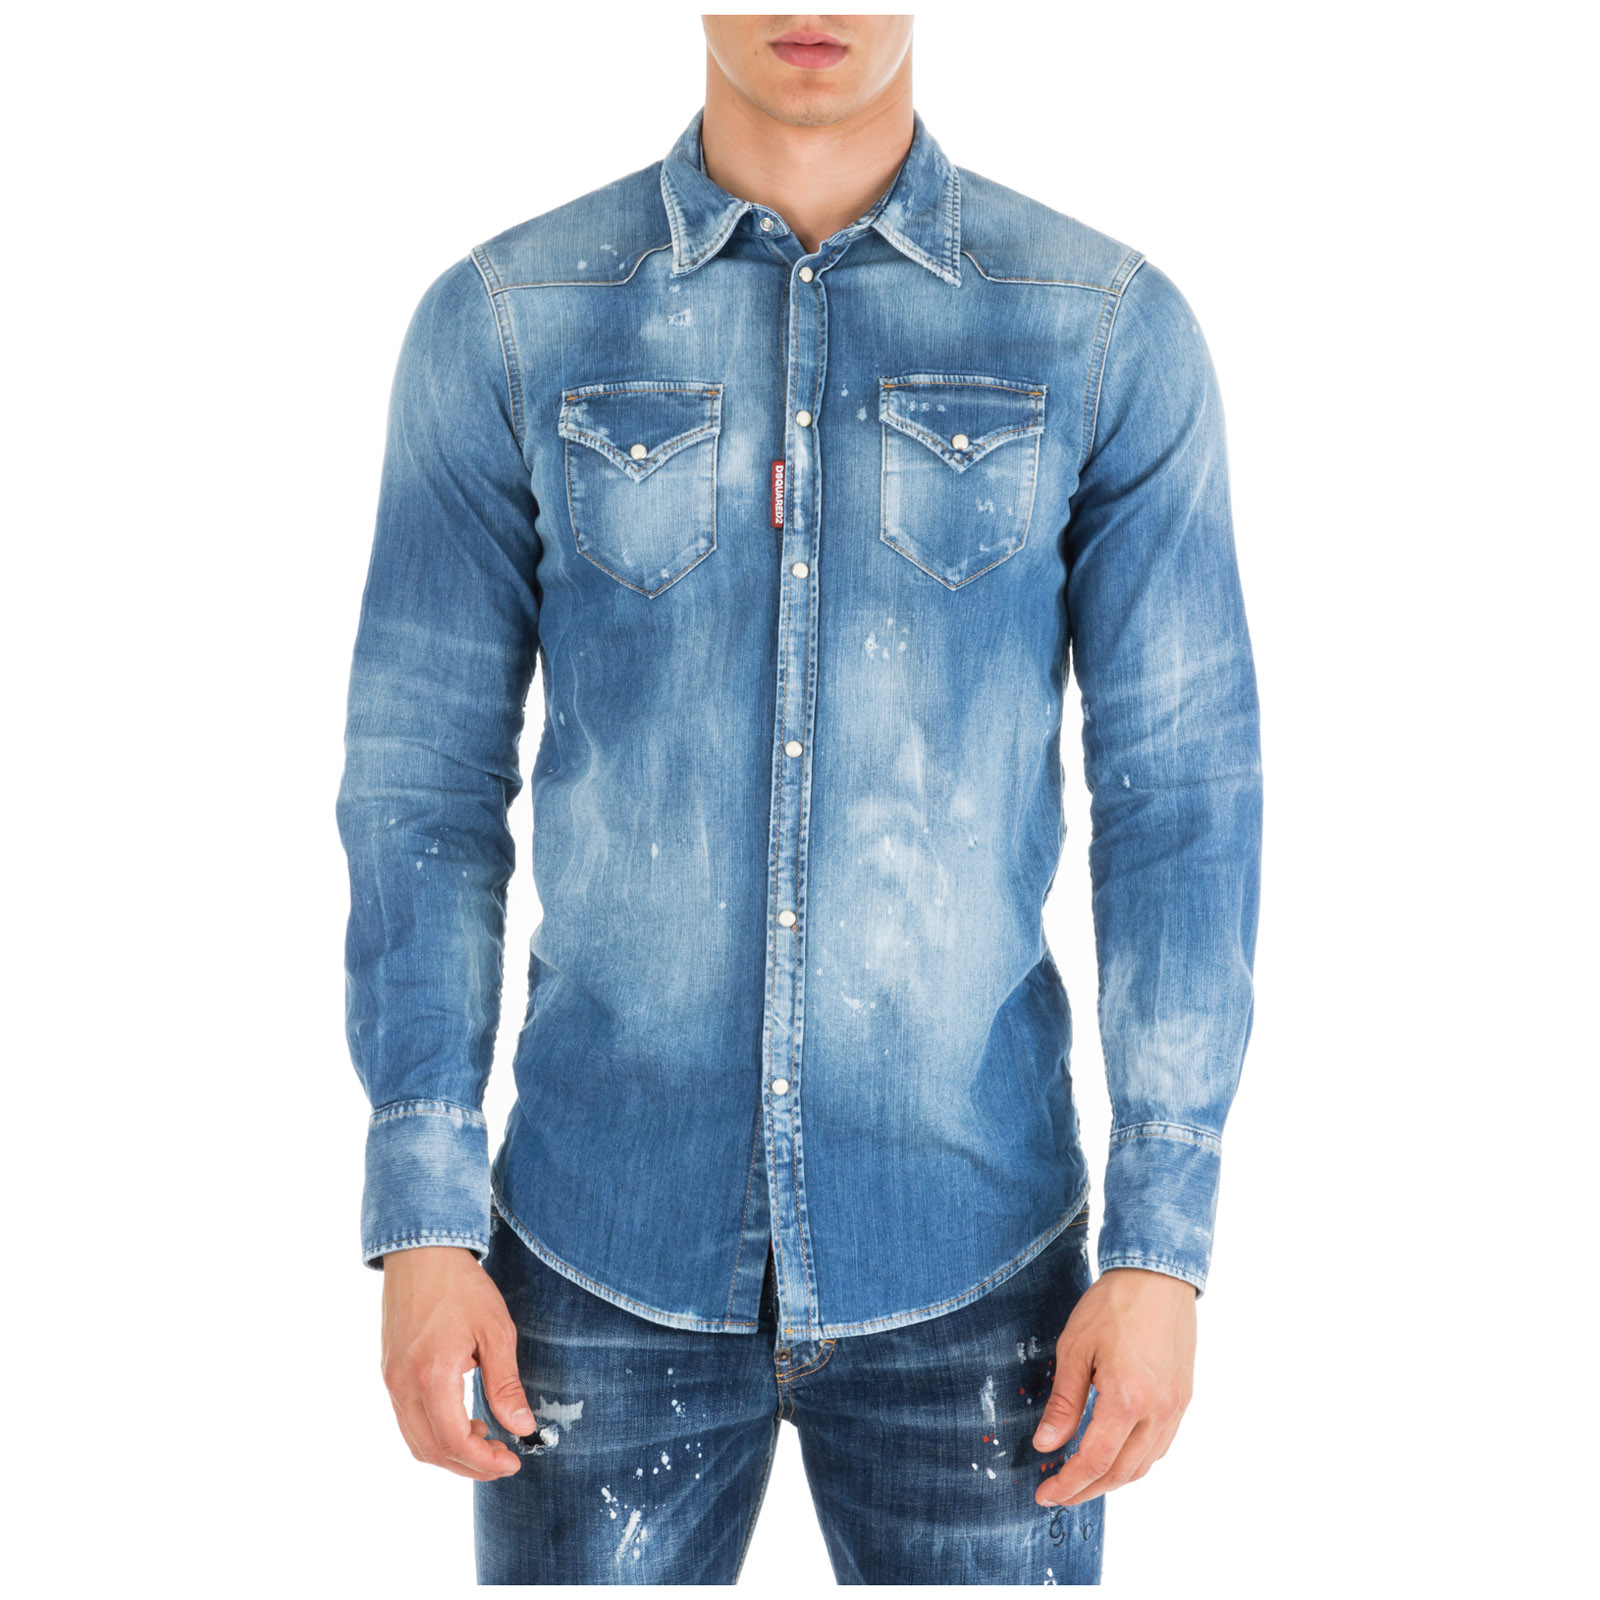 Dsquared2 Men's Long Sleeve Shirt Dress Shirt In Blue